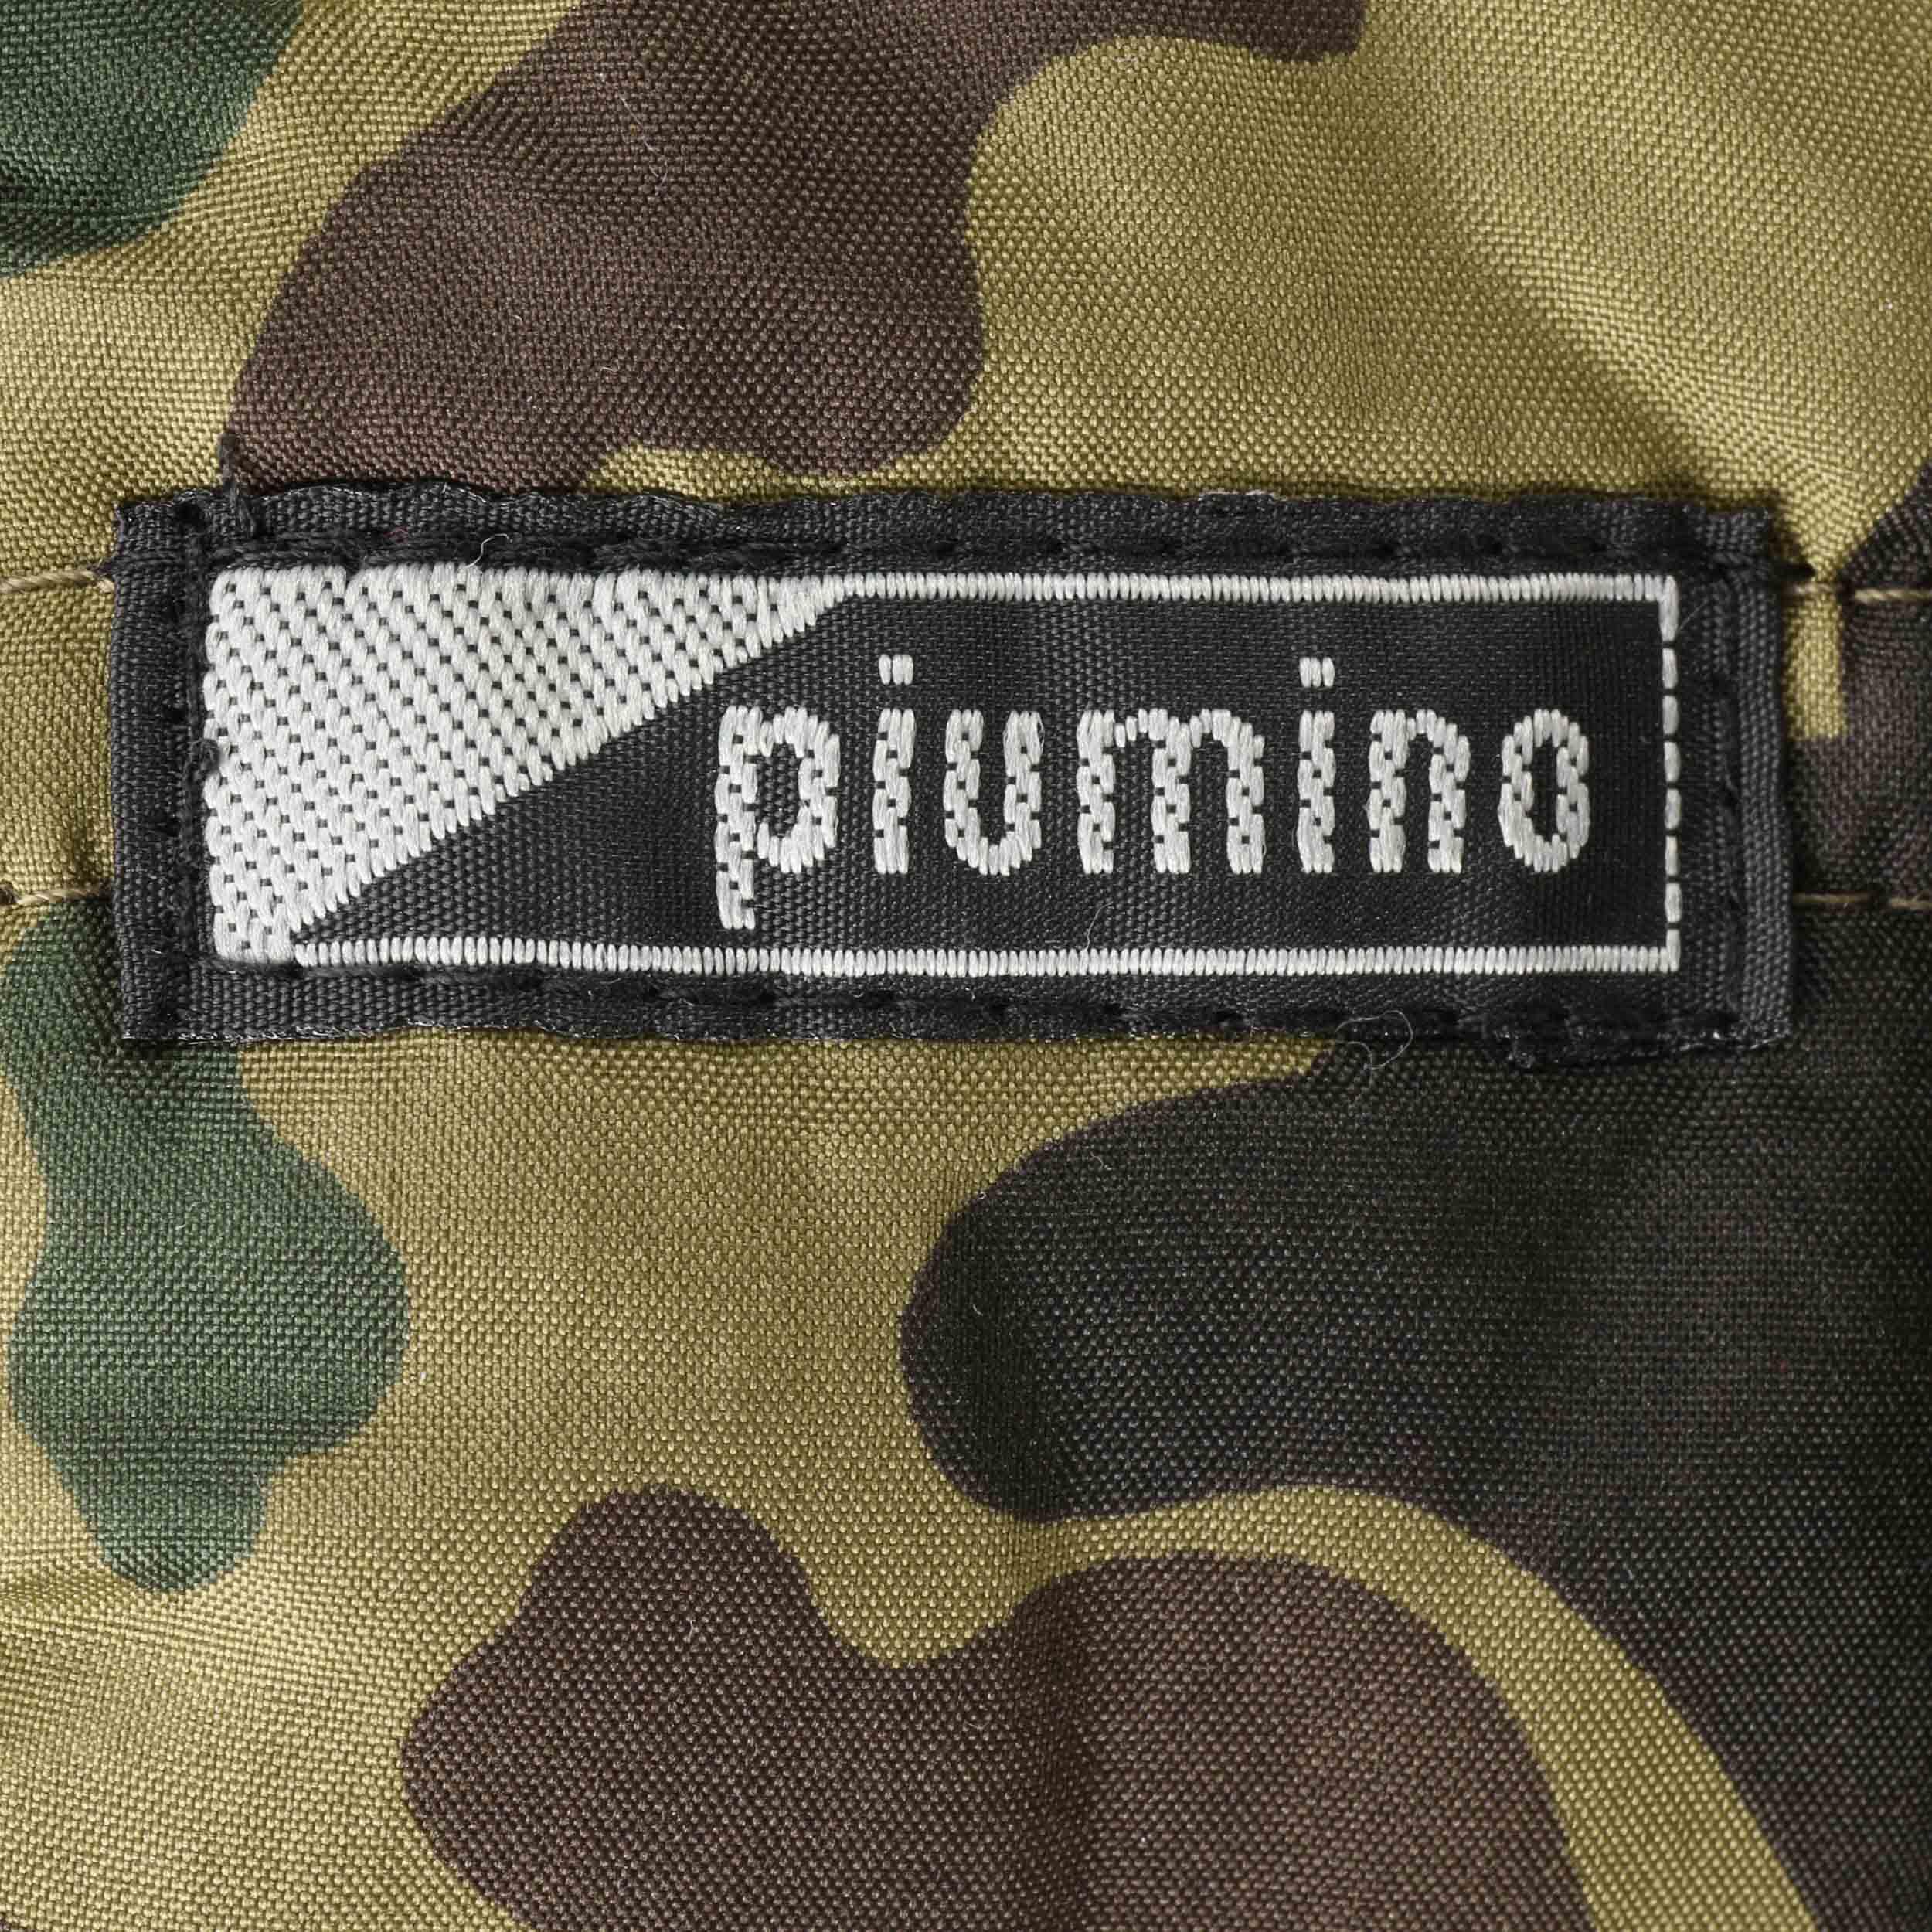 ... Gorra Militar Camouflage con Orejeras by Lipodo - camuflaje 4 ... 3e3fb4d5aaf